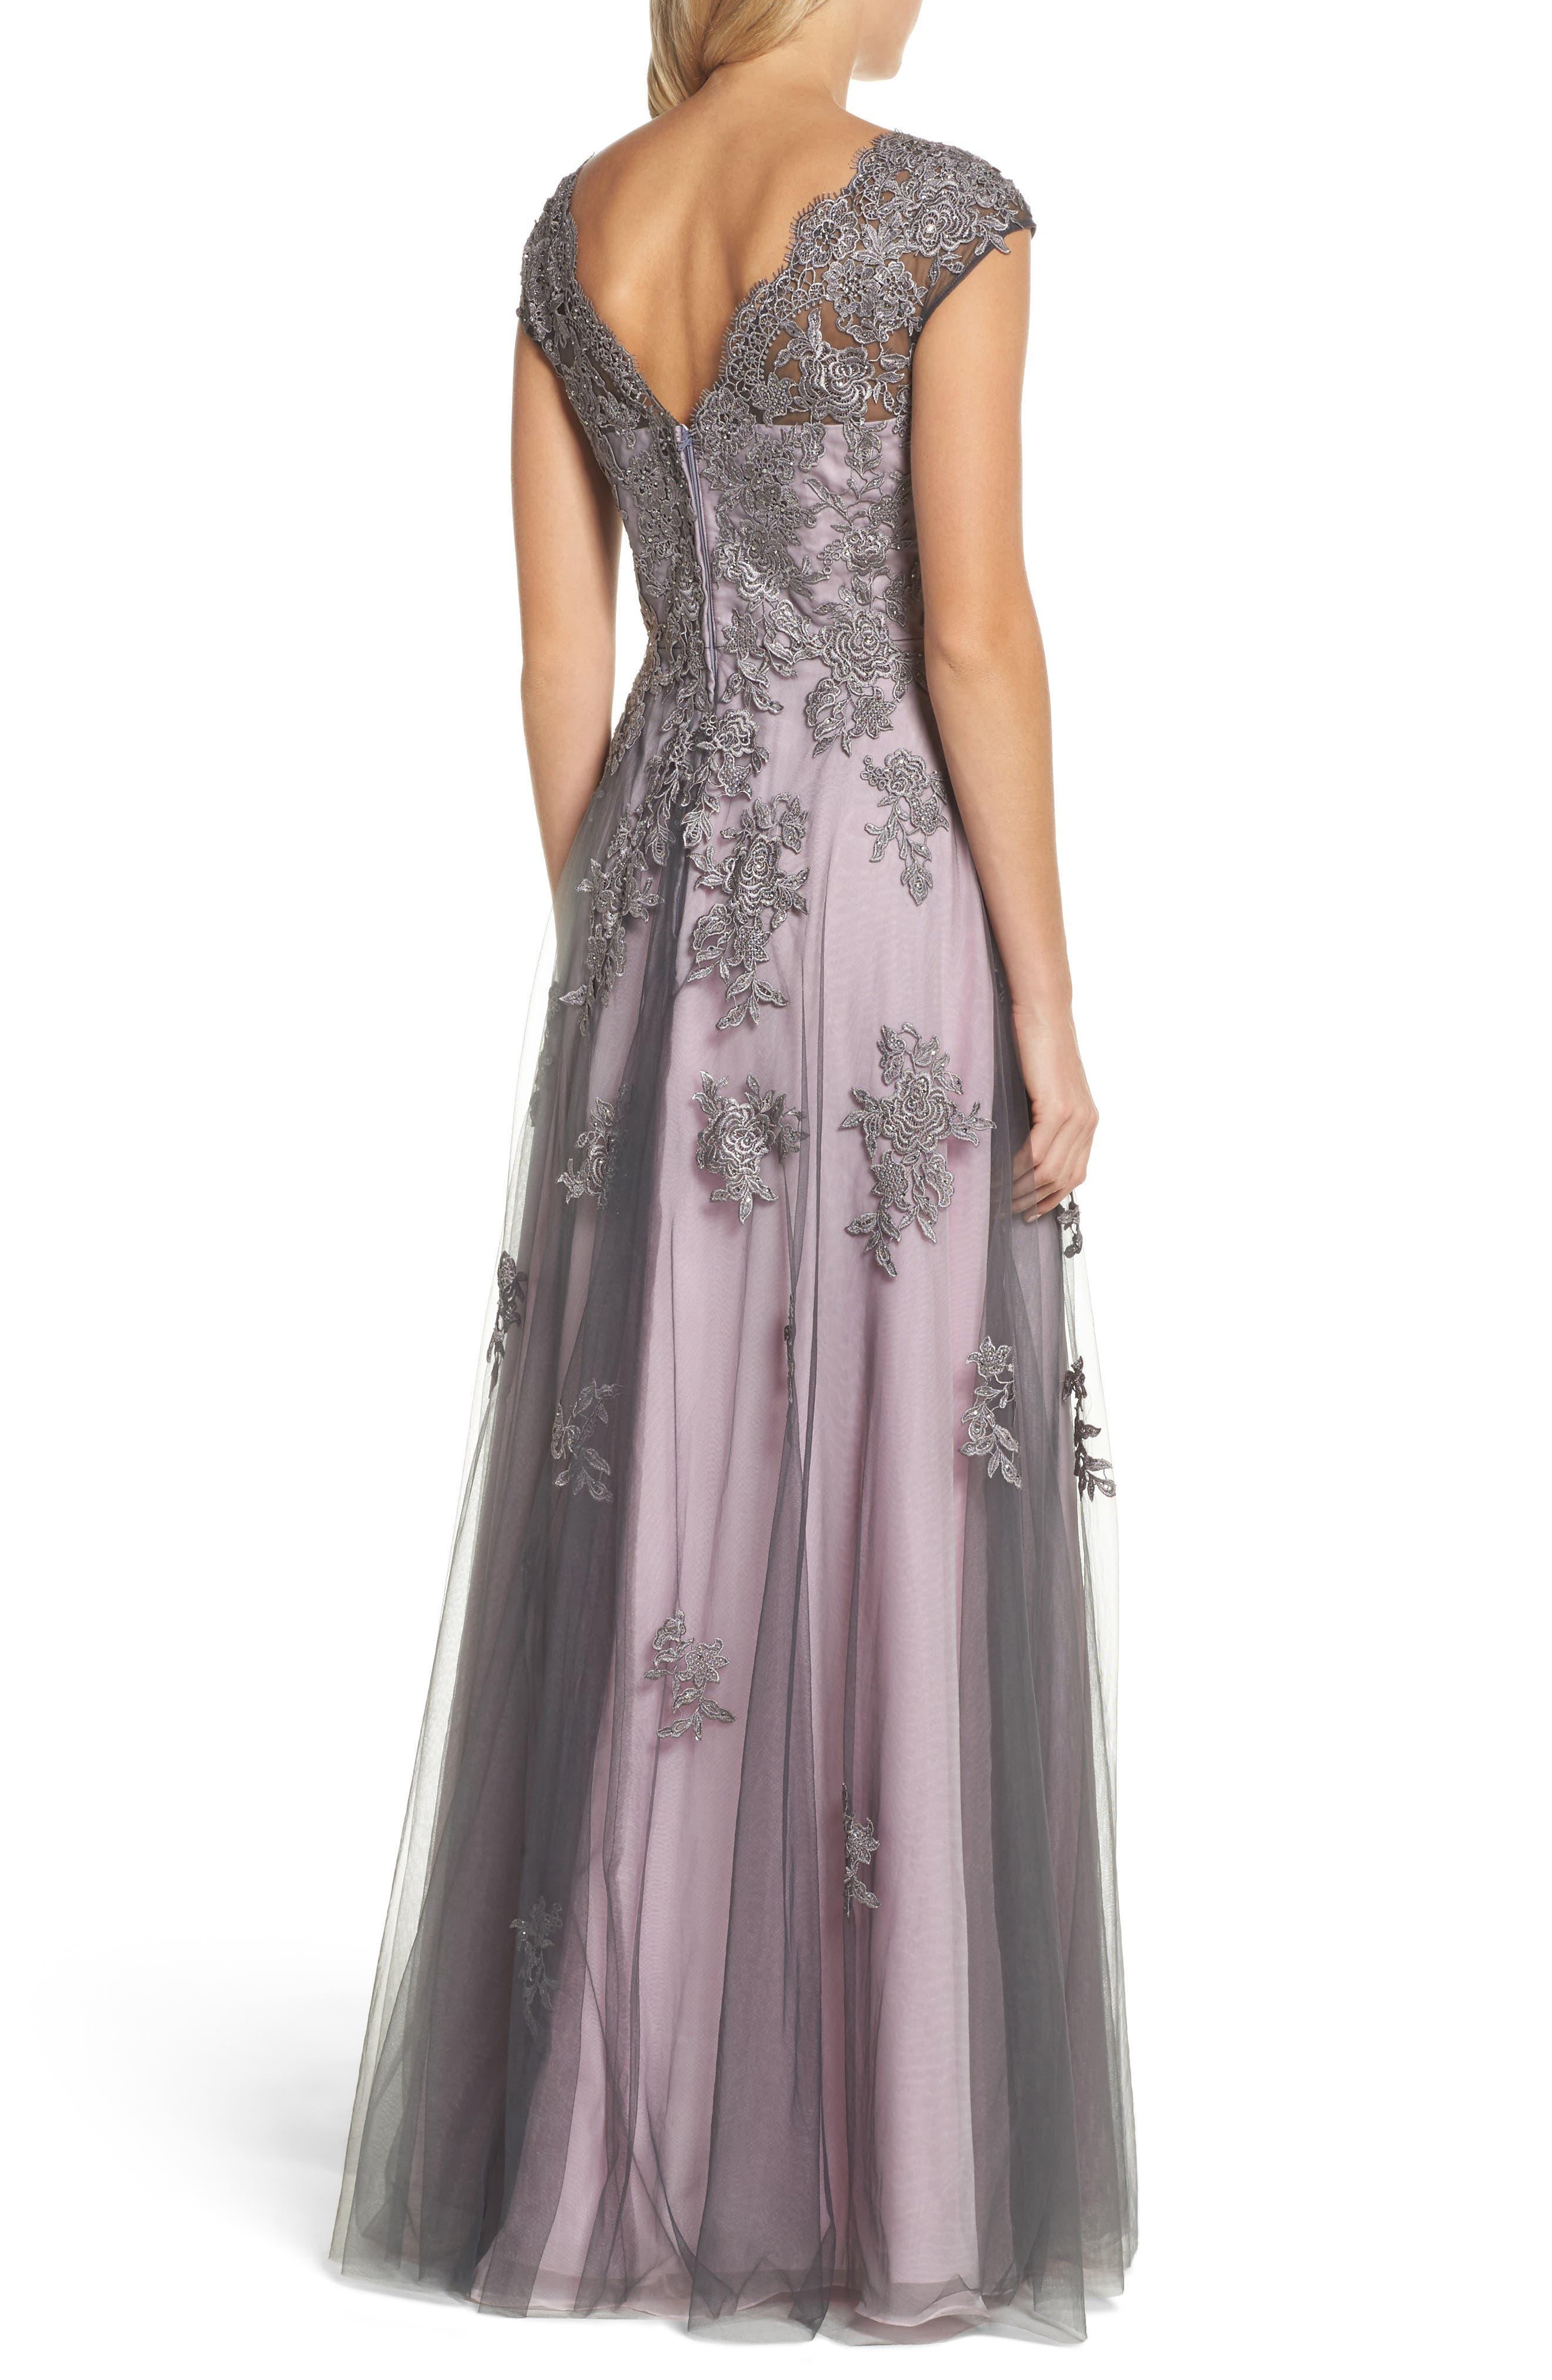 LA FEMME, Embellished Mesh A-Line Gown, Alternate thumbnail 2, color, PINK/ GRAY